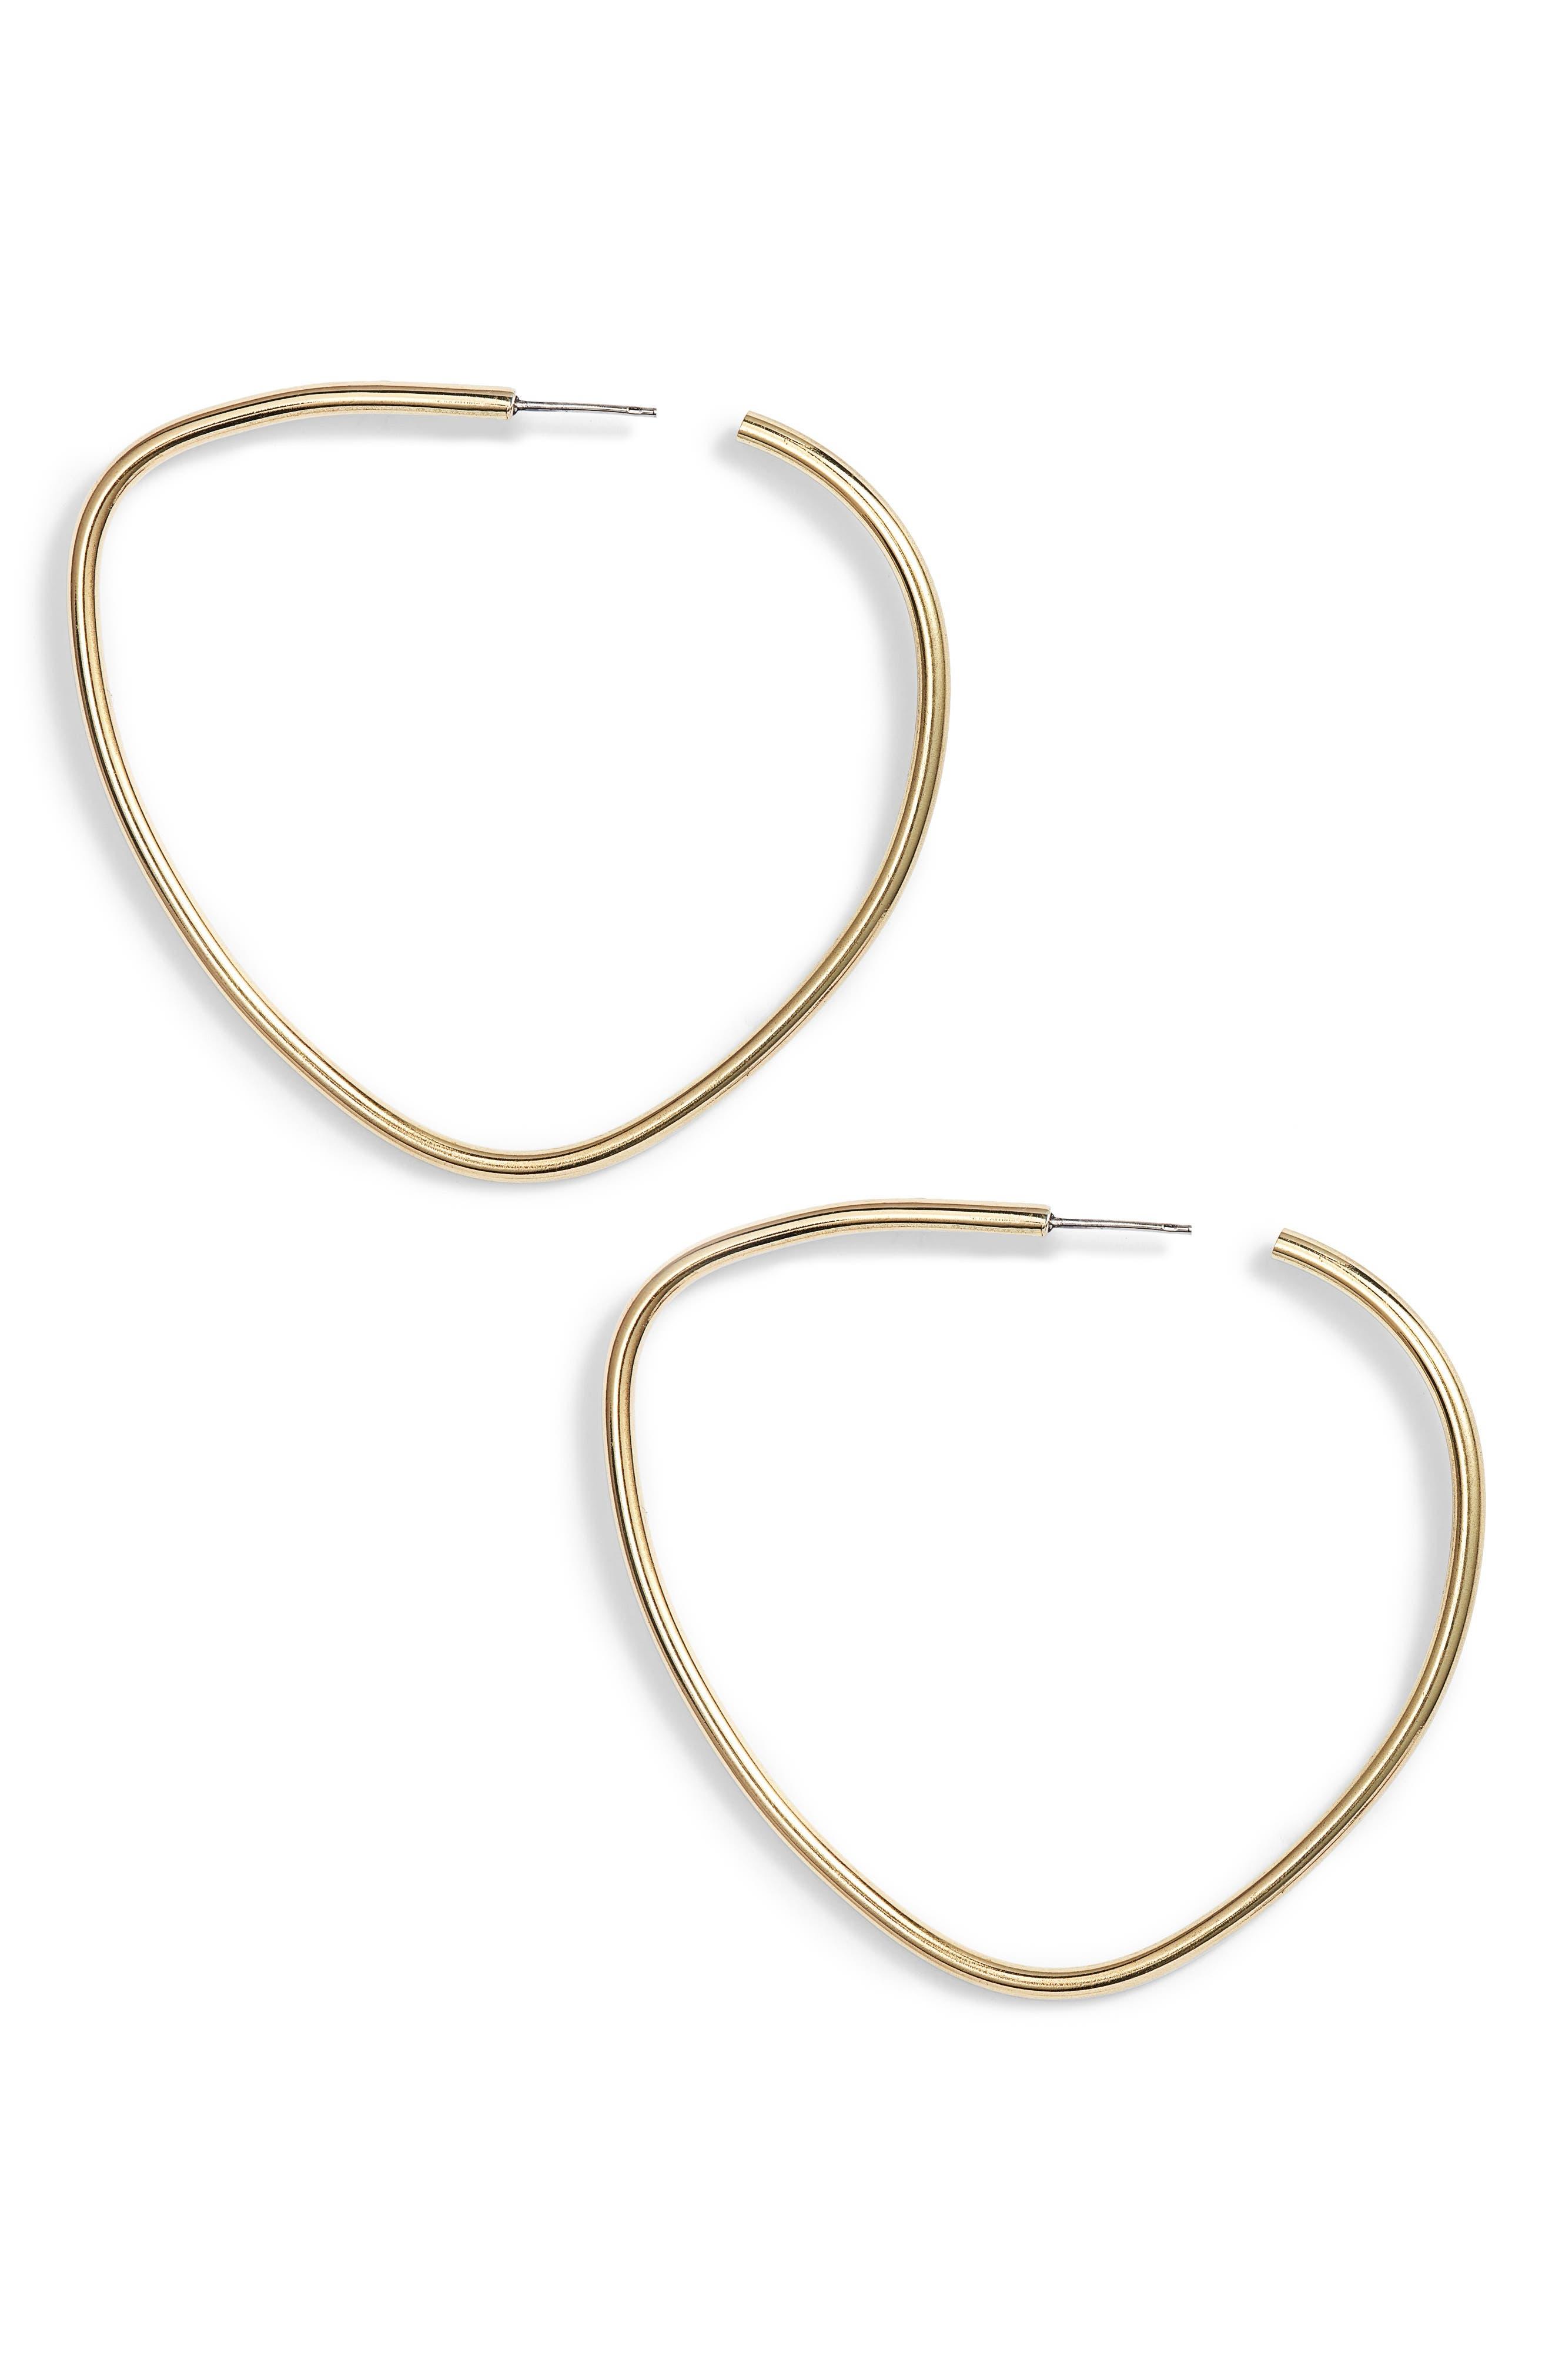 Maxi Sabi Organic Hoop Earrings,                         Main,                         color, Brass